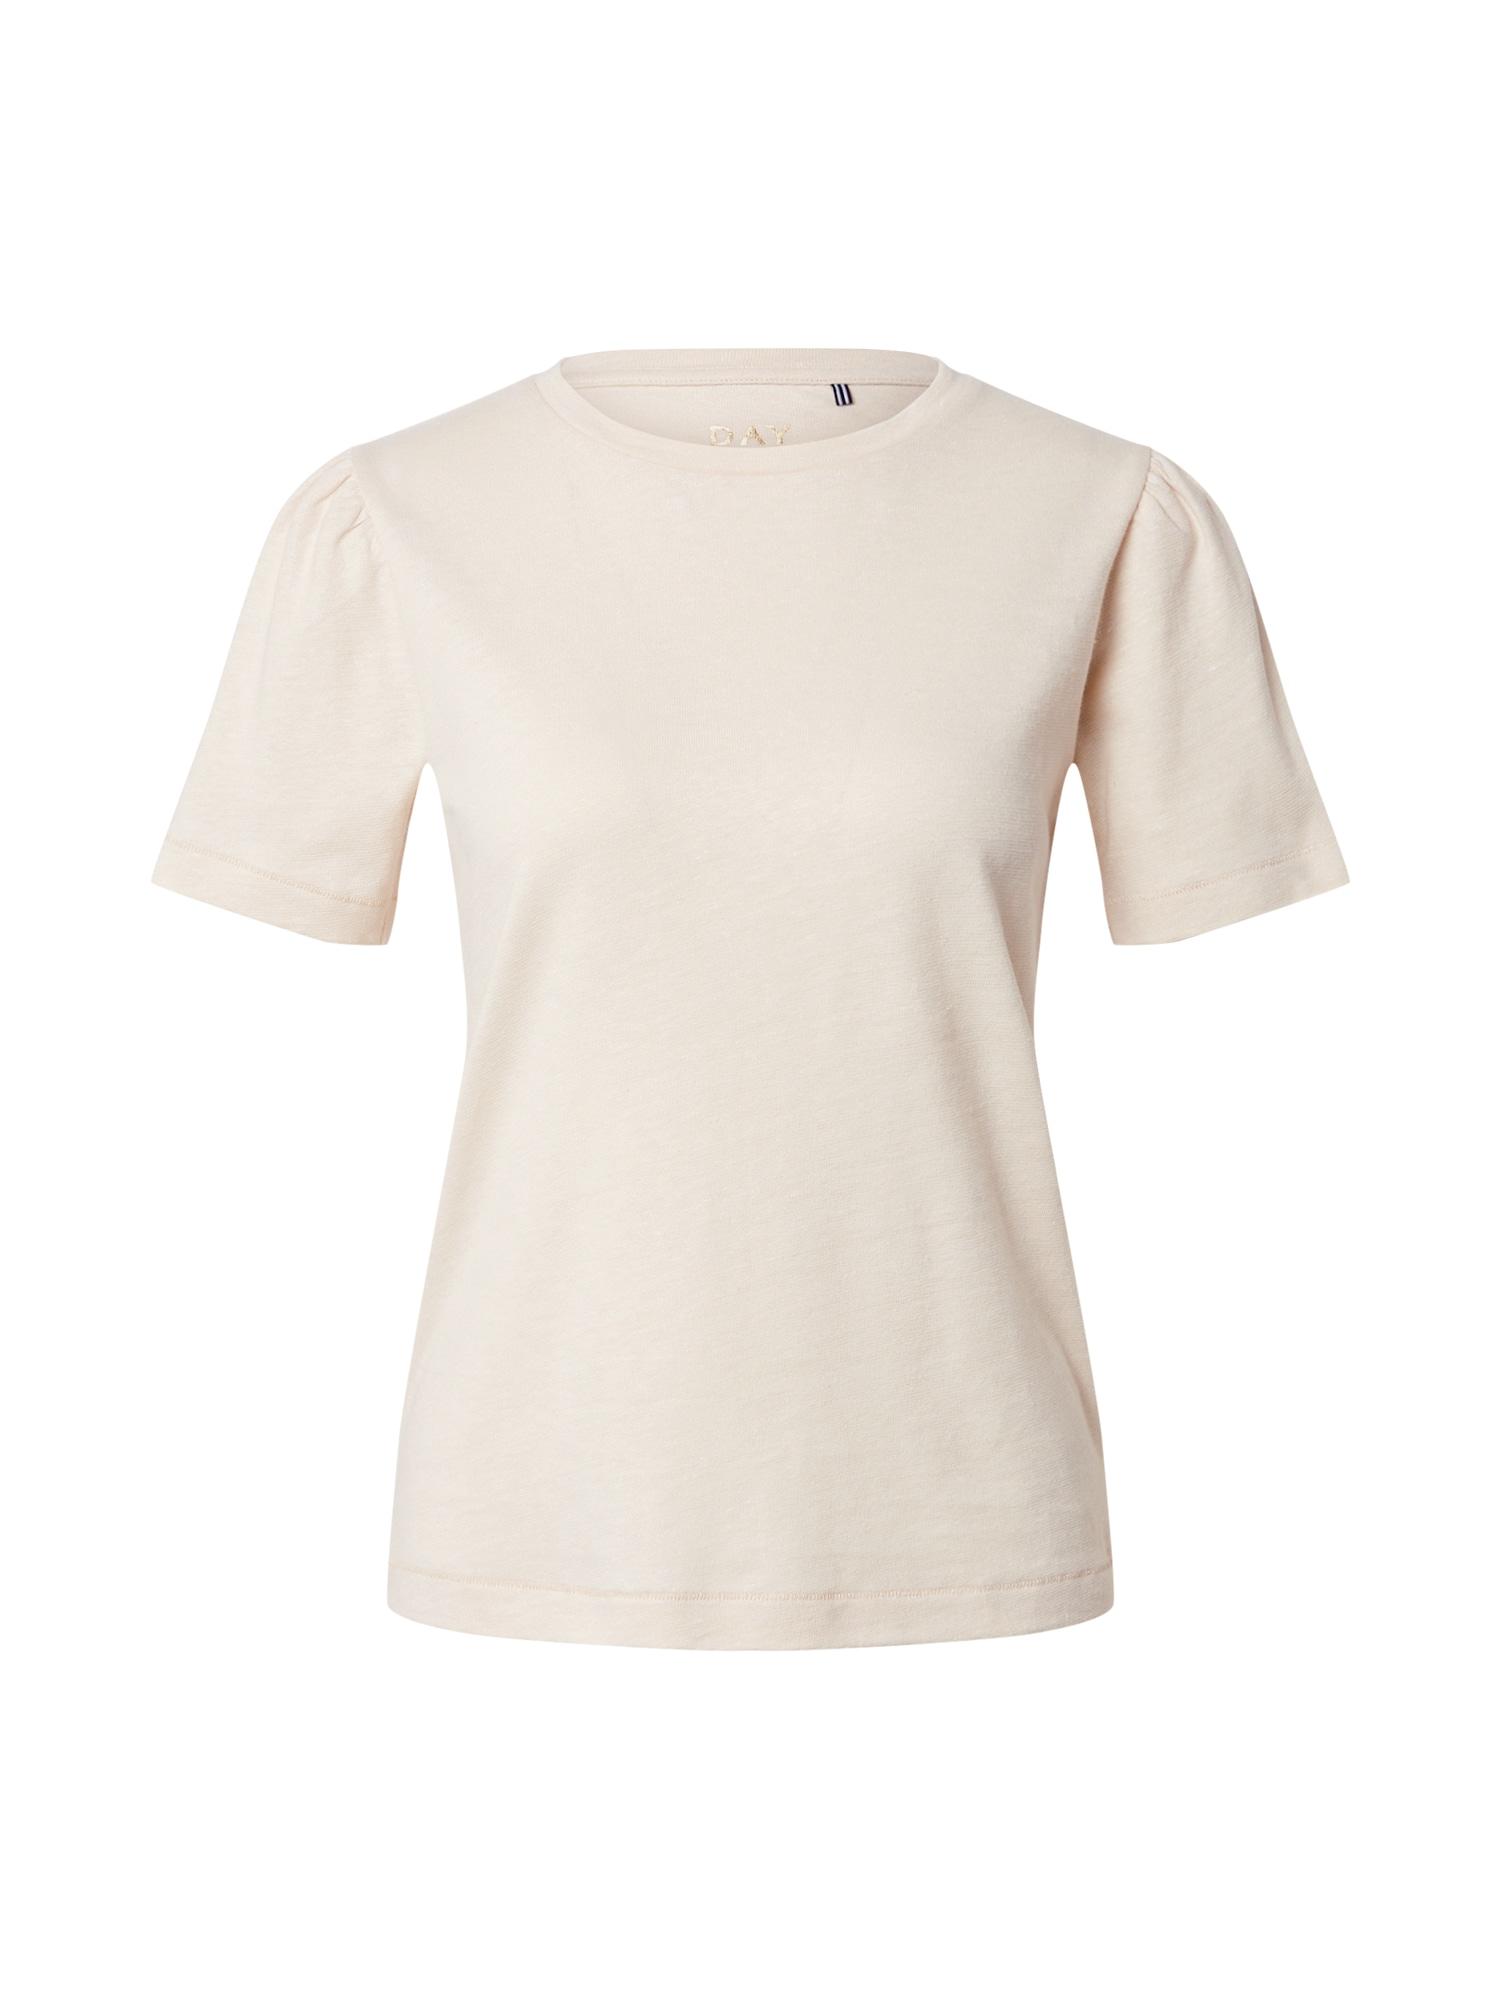 DAY BIRGER ET MIKKELSEN Marškinėliai